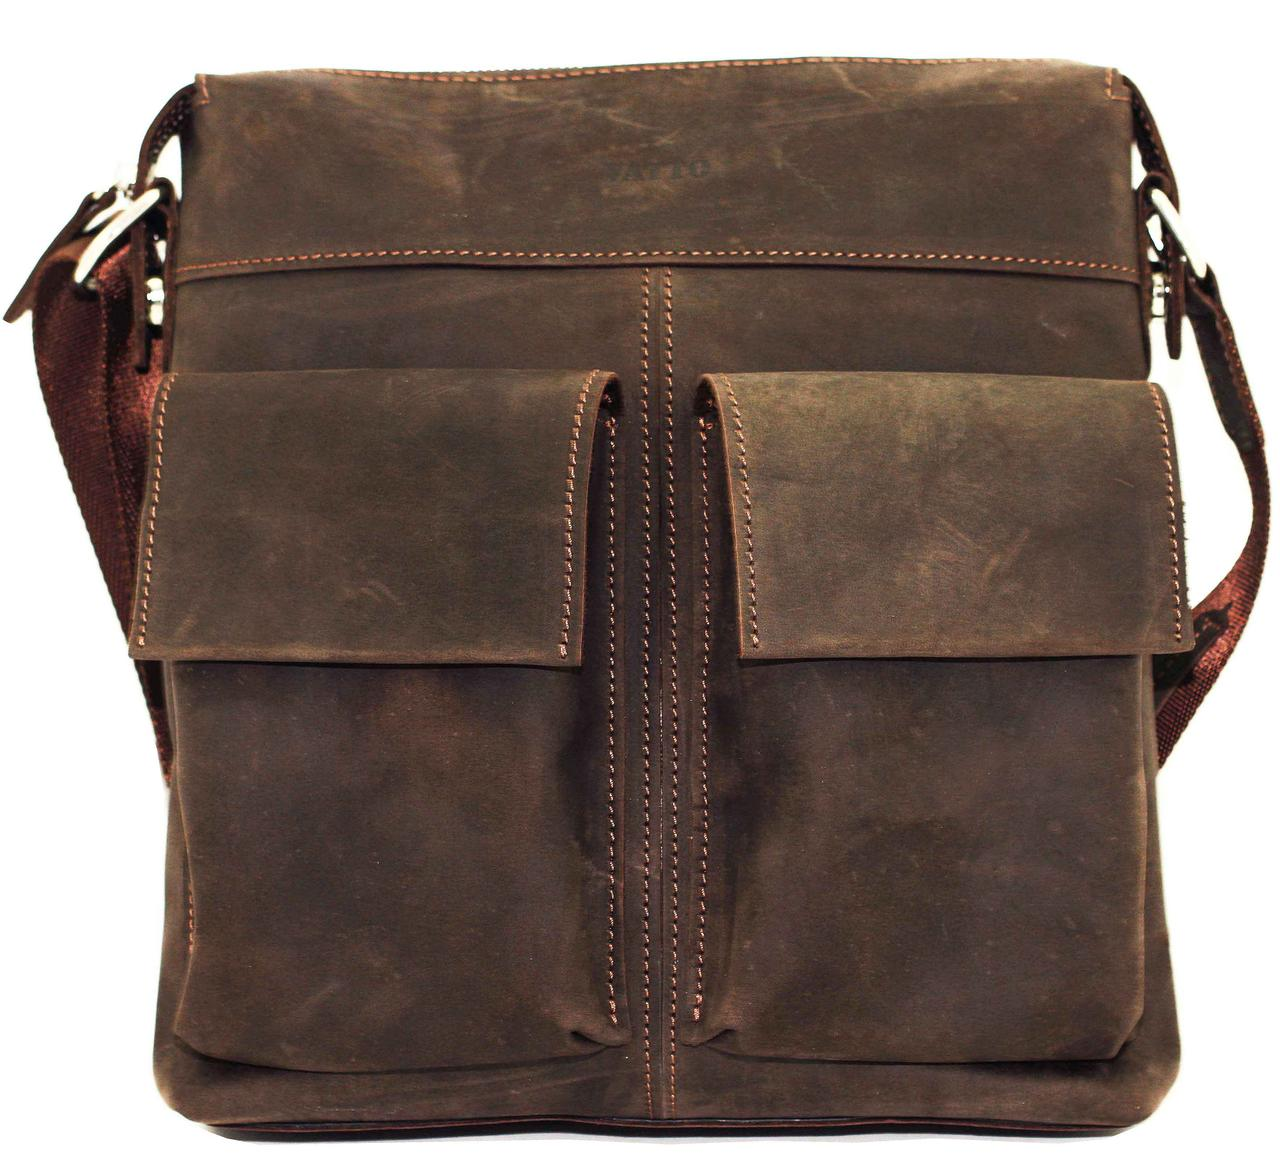 Чоловіча сумка VATTO Mk41.4 Kr450